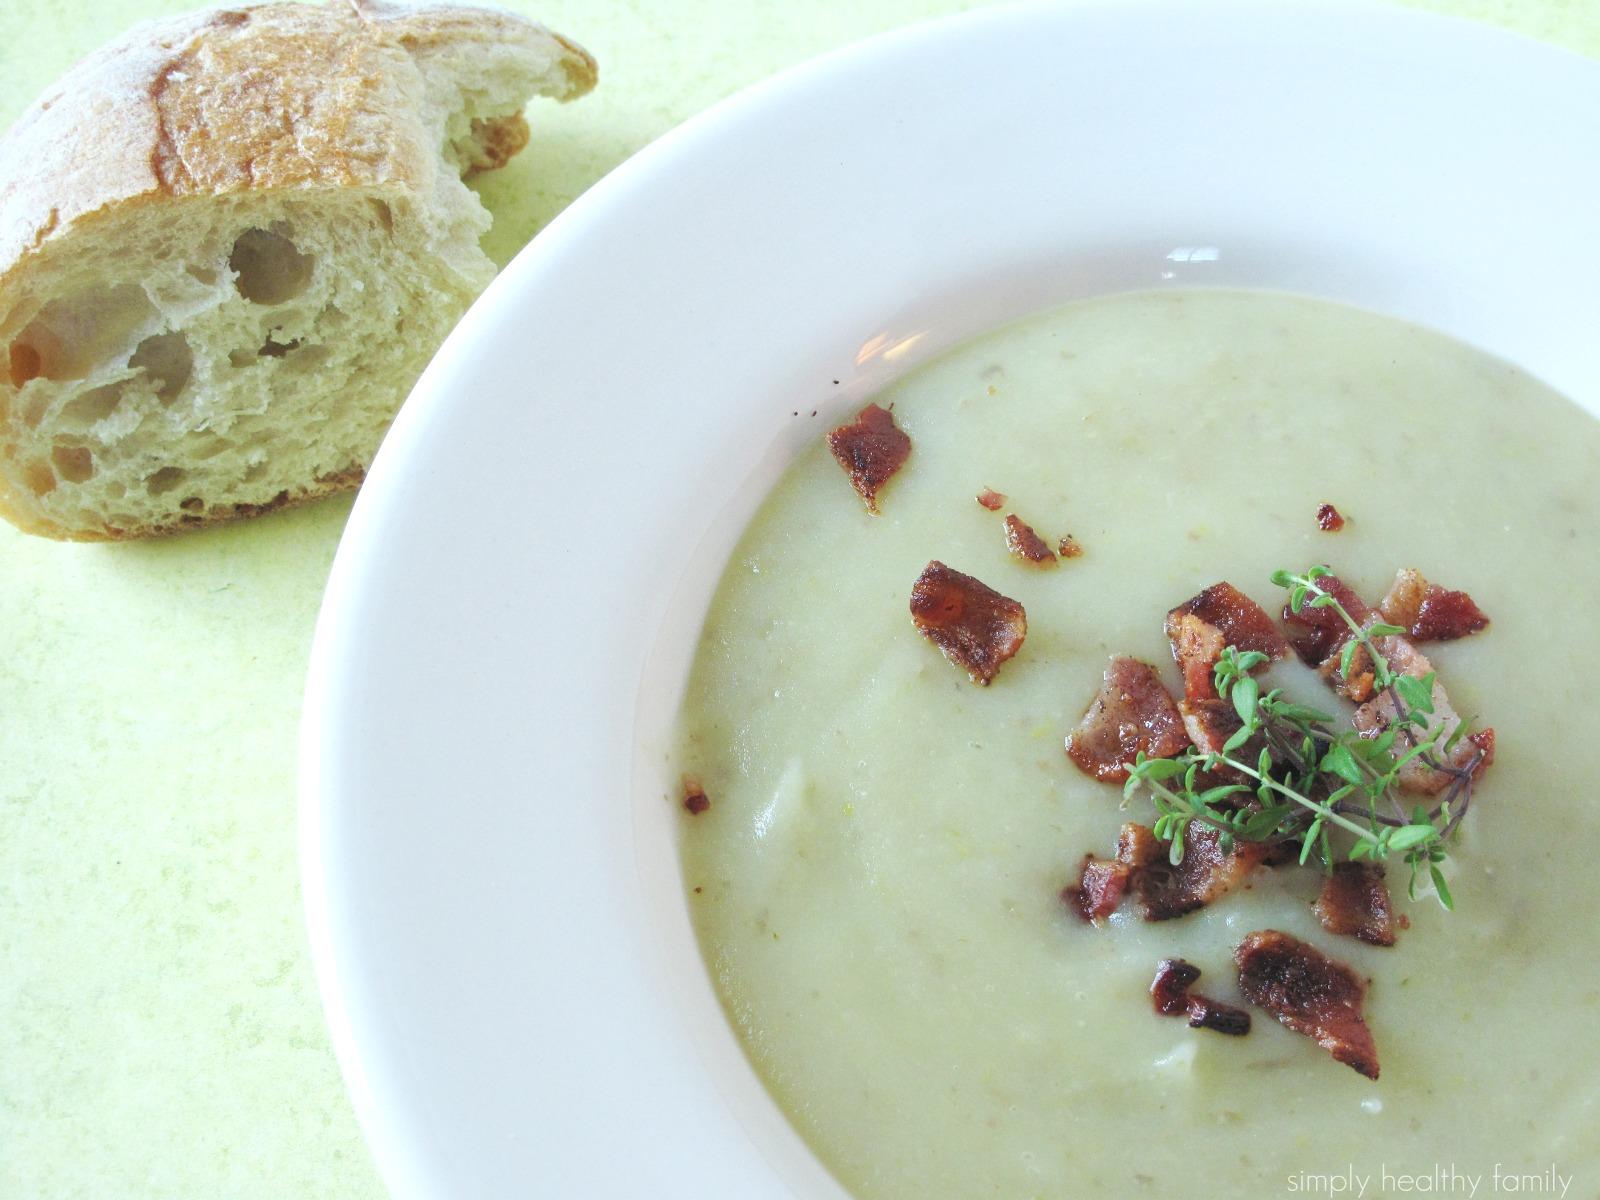 Simply Healthy Family: Potato Leek Soup Makeover